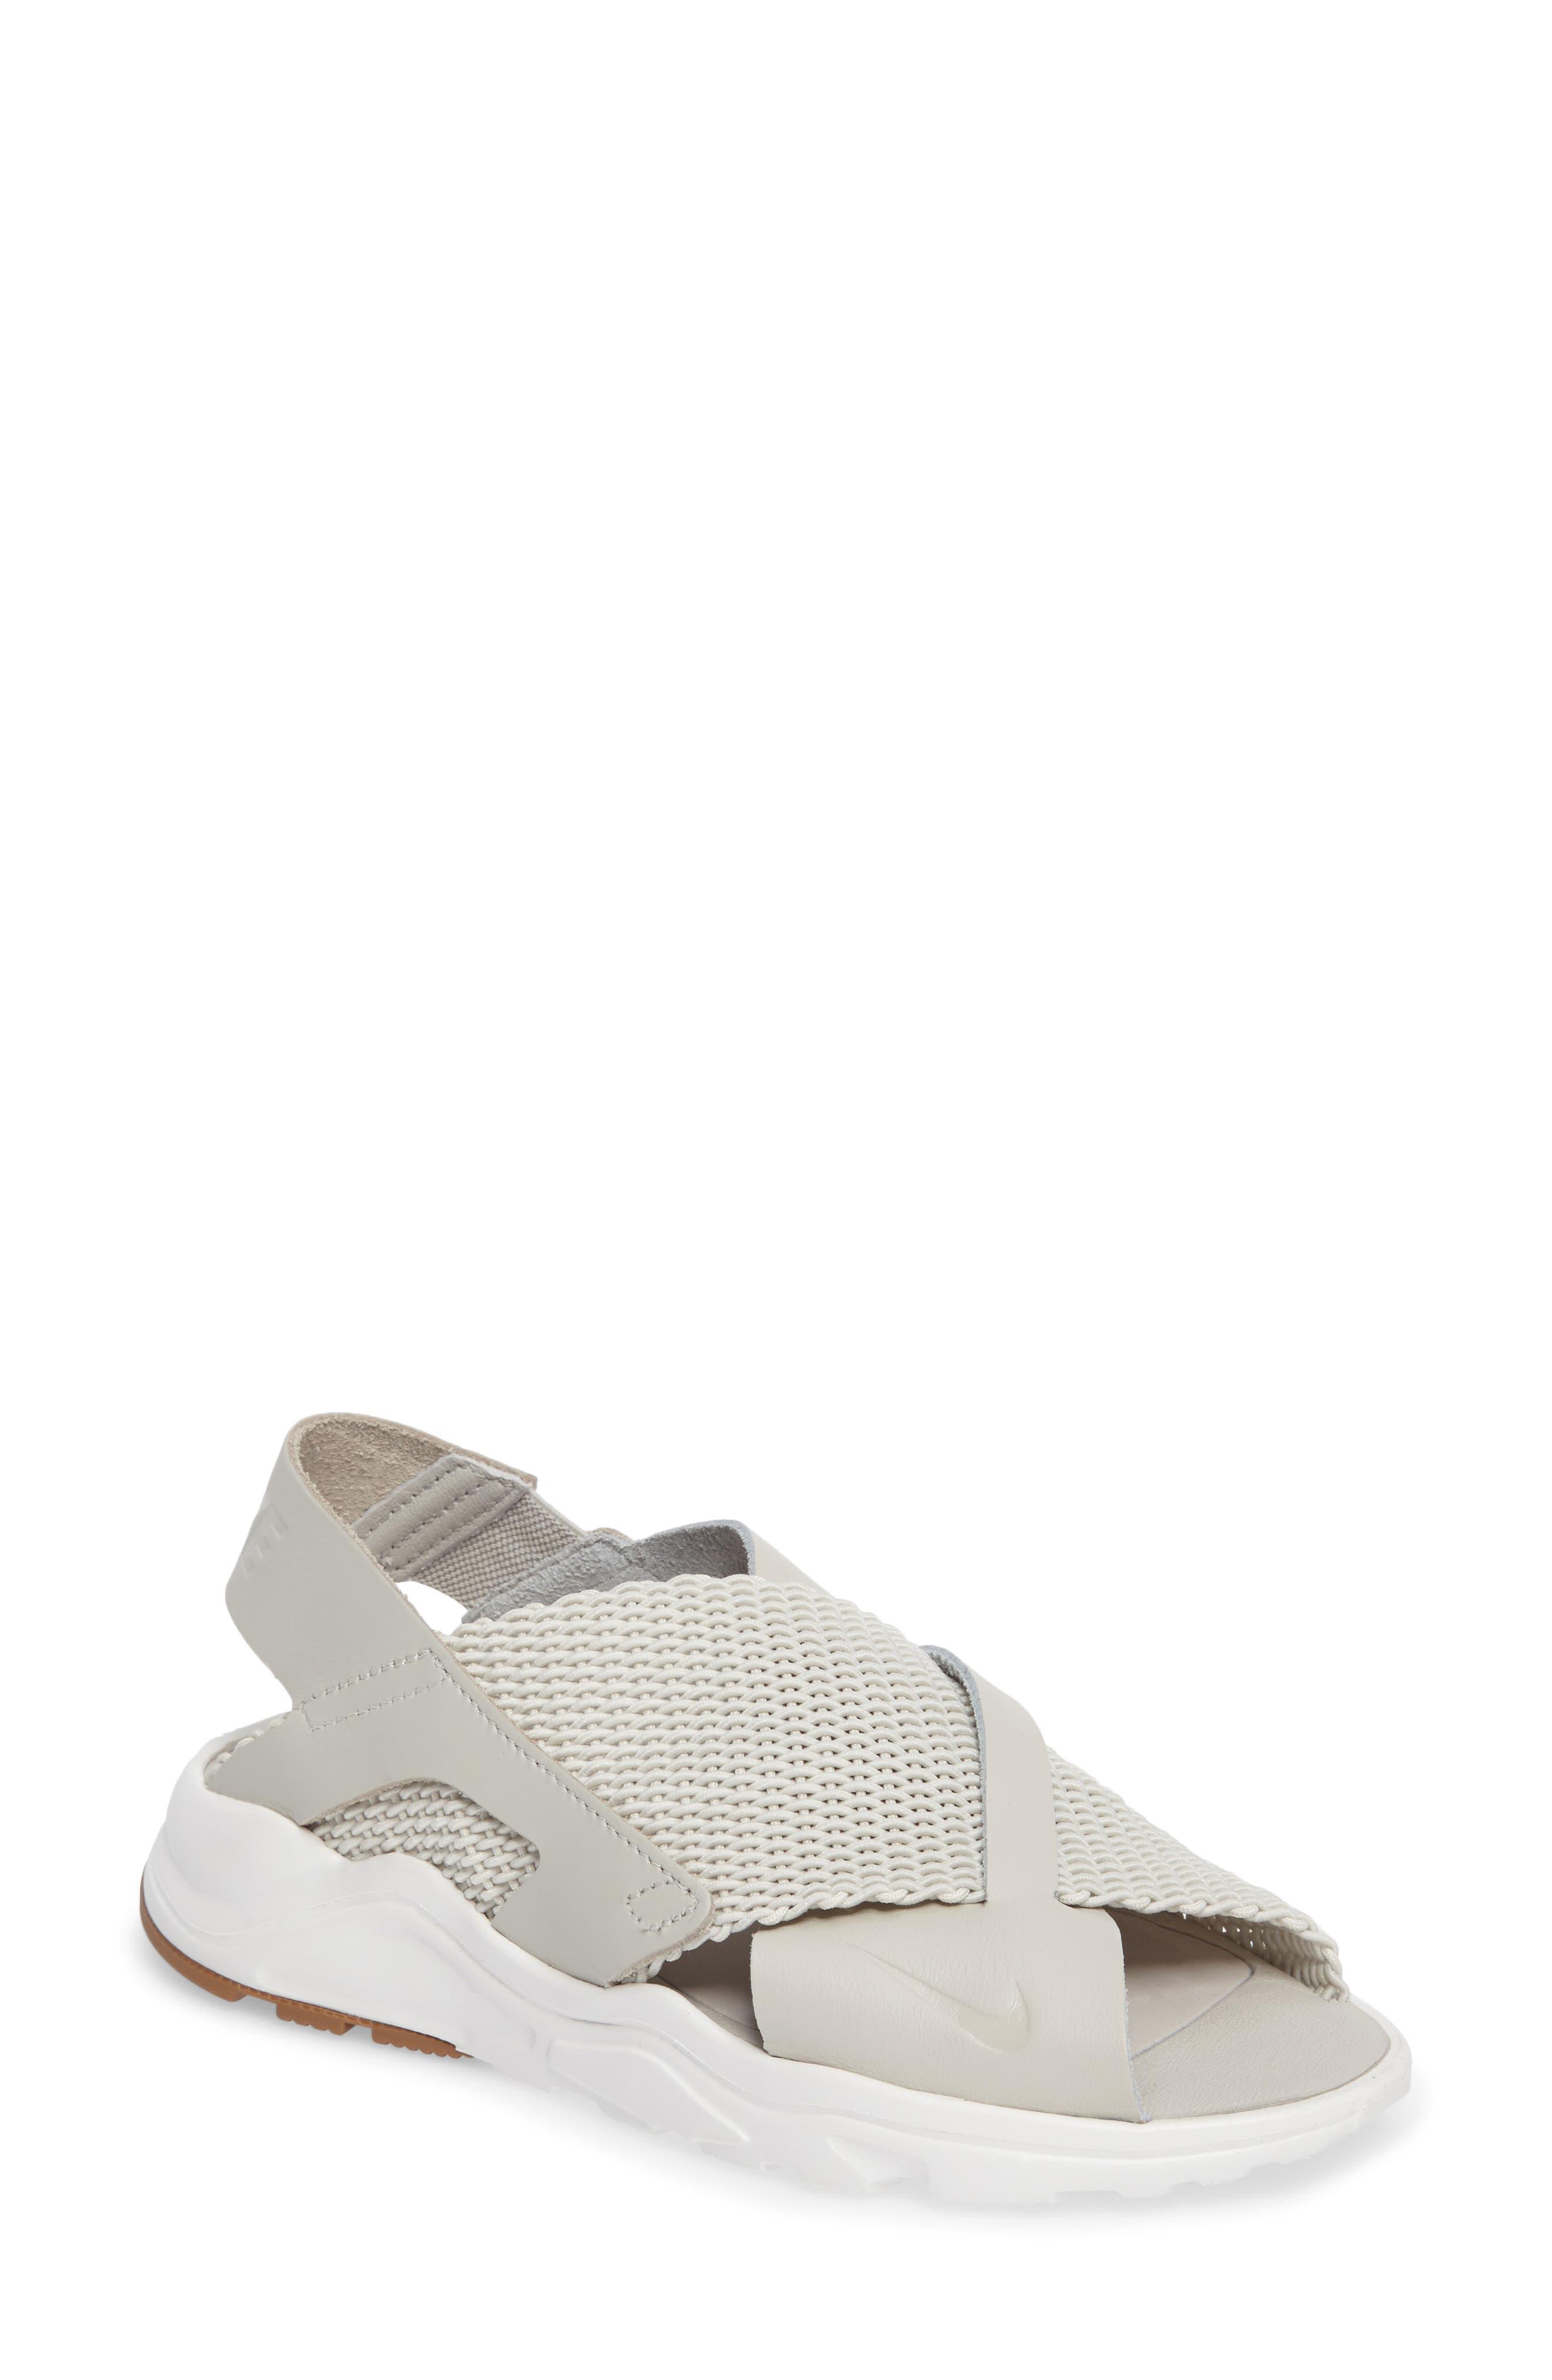 new style 4c864 e3ccc ... shopping nike air huarache ultra sport sandal women nordstrom 0ca83  c6daf